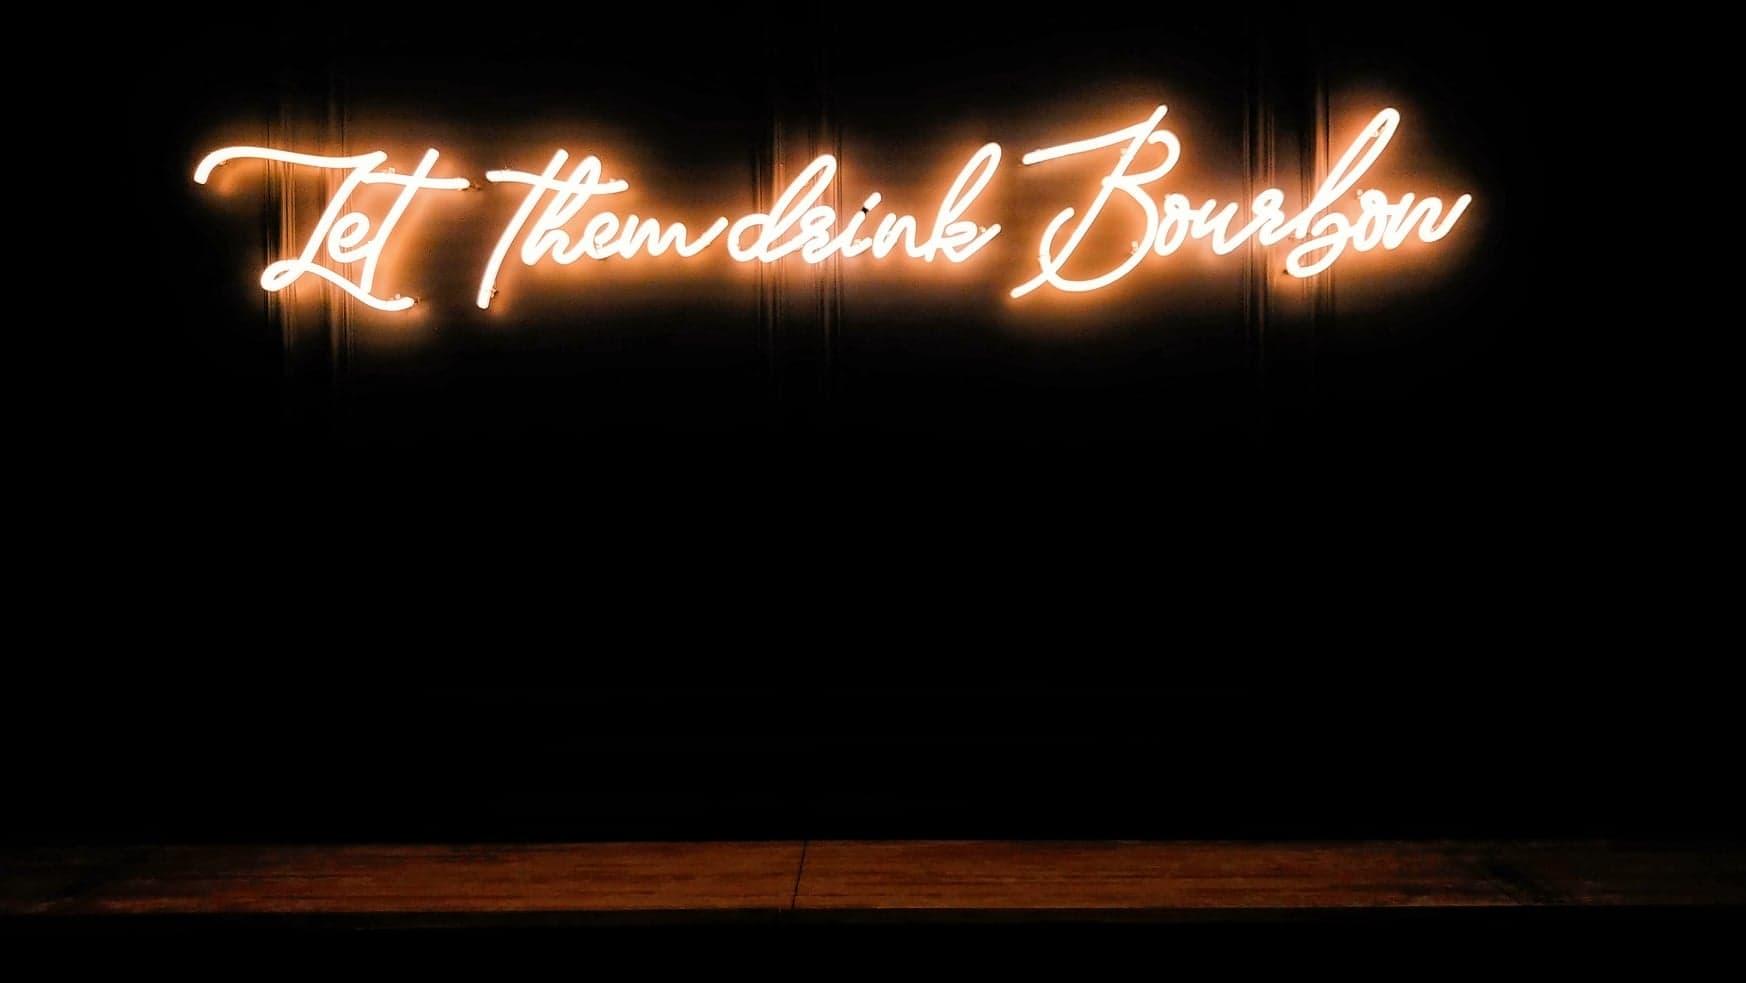 Chateau-Elan-Neon-at-Louis-House-of-Bourbon-Shuffleboard-Table-2020-09-23